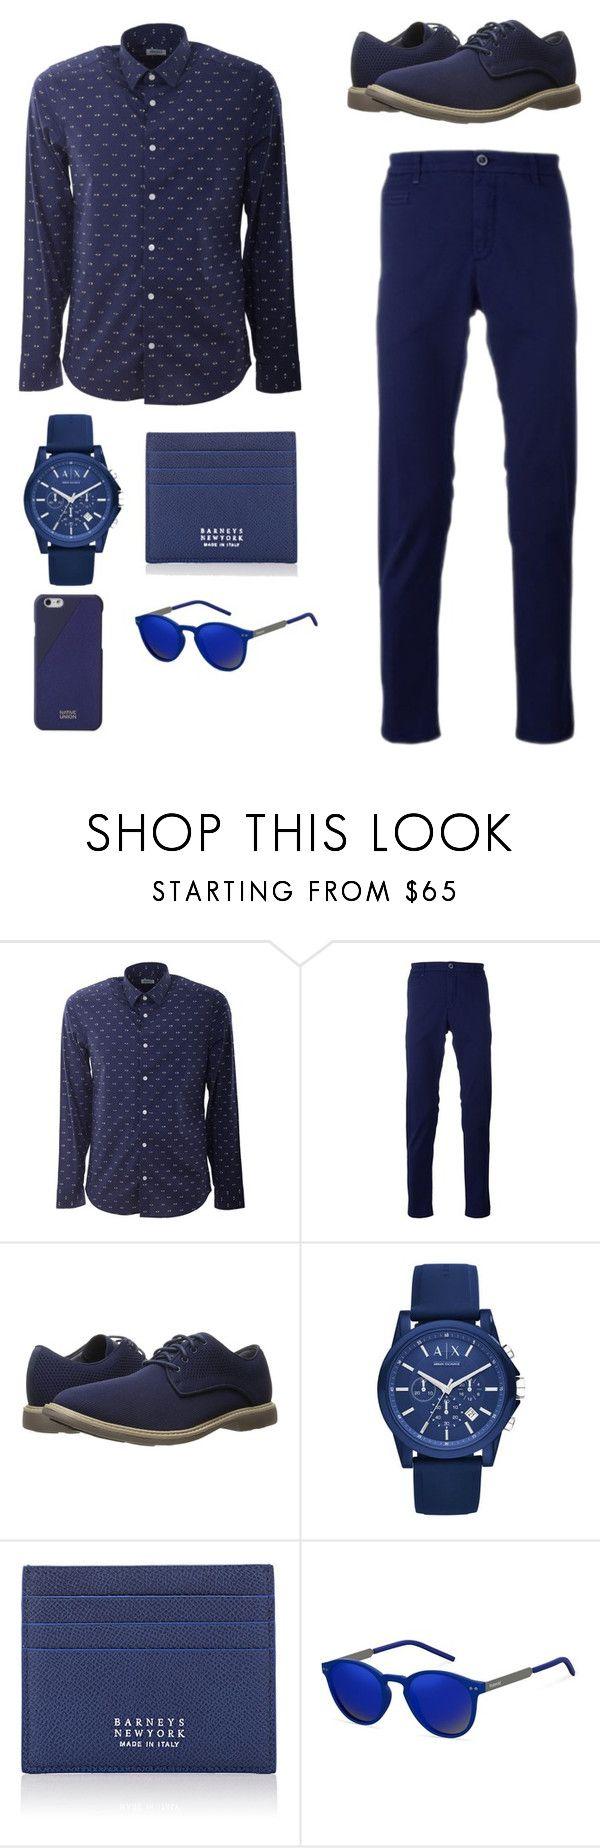 """Blue | Men's fashion"" by maria-casiana ❤ liked on Polyvore featuring Kenzo, Re-HasH, Mark Nason, Armani Exchange, Barneys New York, Polaroid, Native Union, men's fashion and menswear"